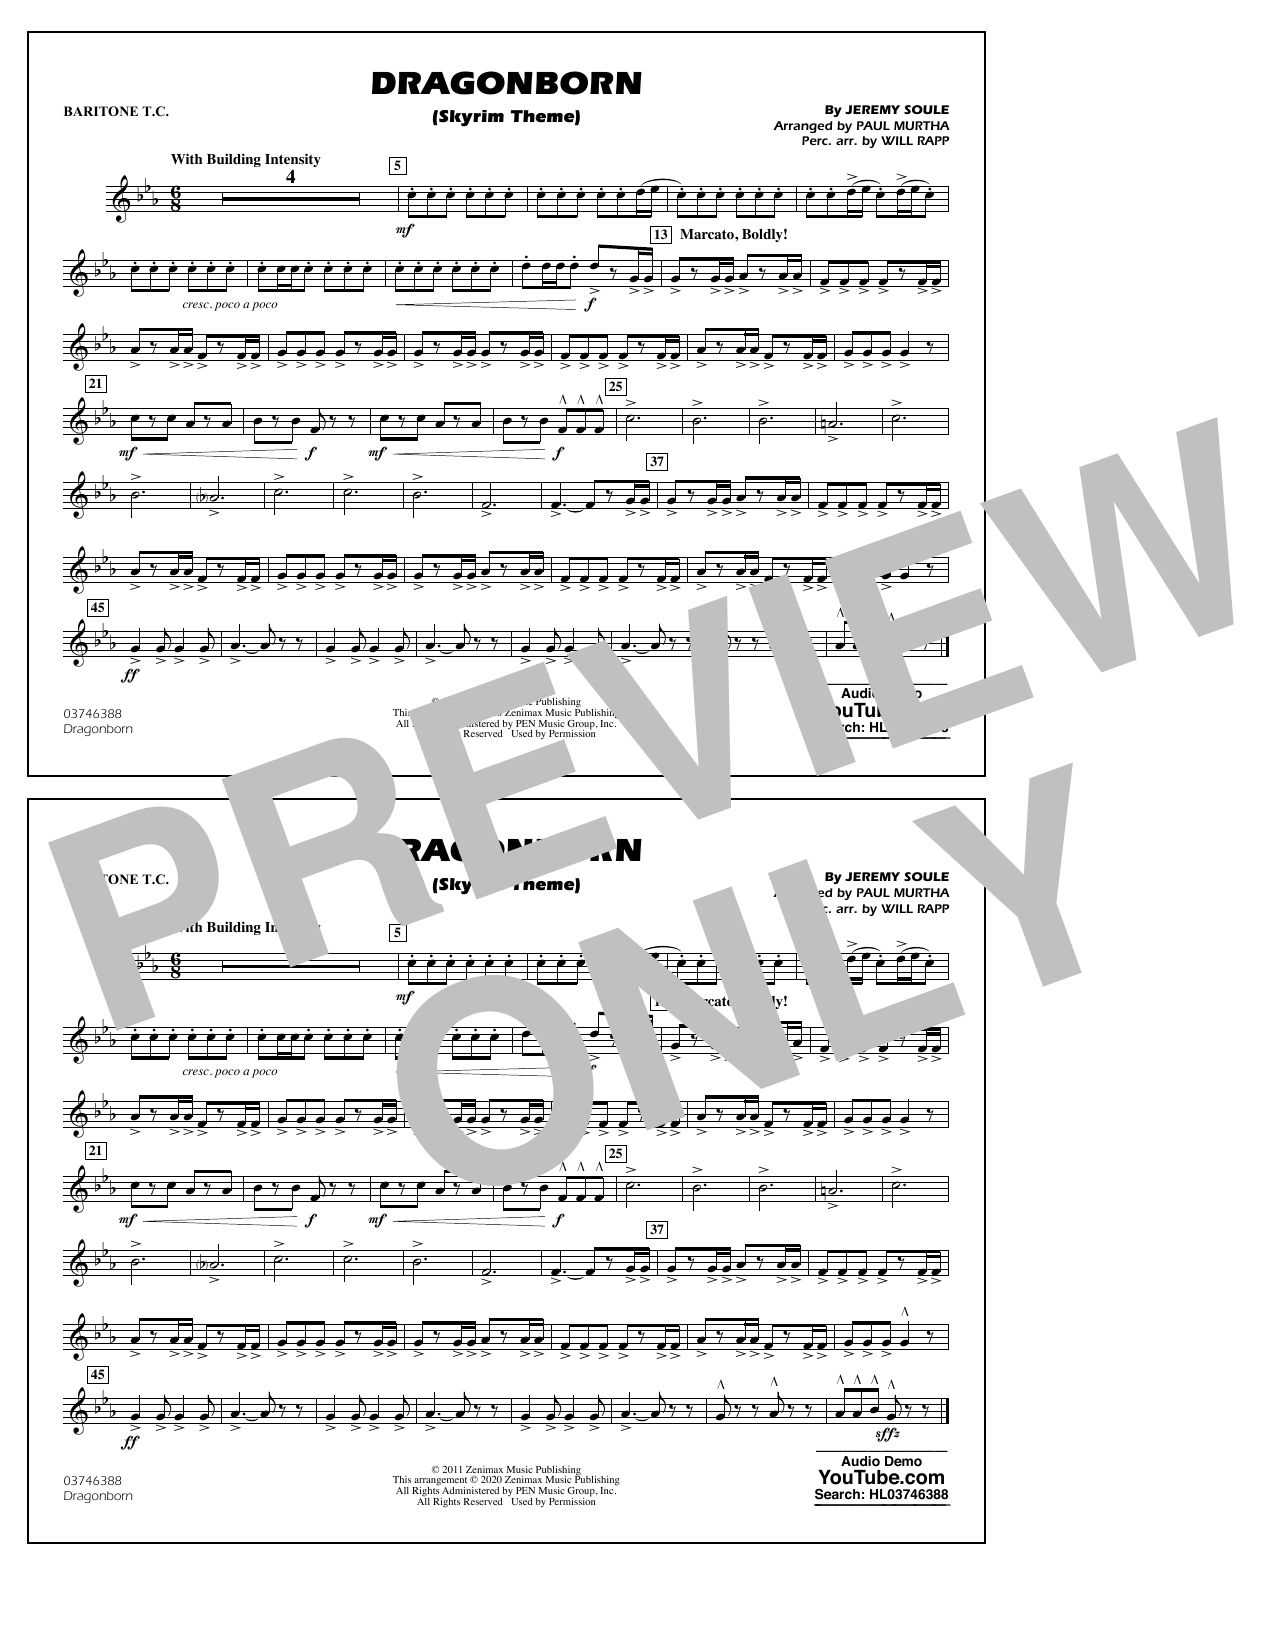 Dragonborn (Skyrim Theme) (arr. Will Rapp & Paul Murtha) - Baritone T.C. Sheet Music